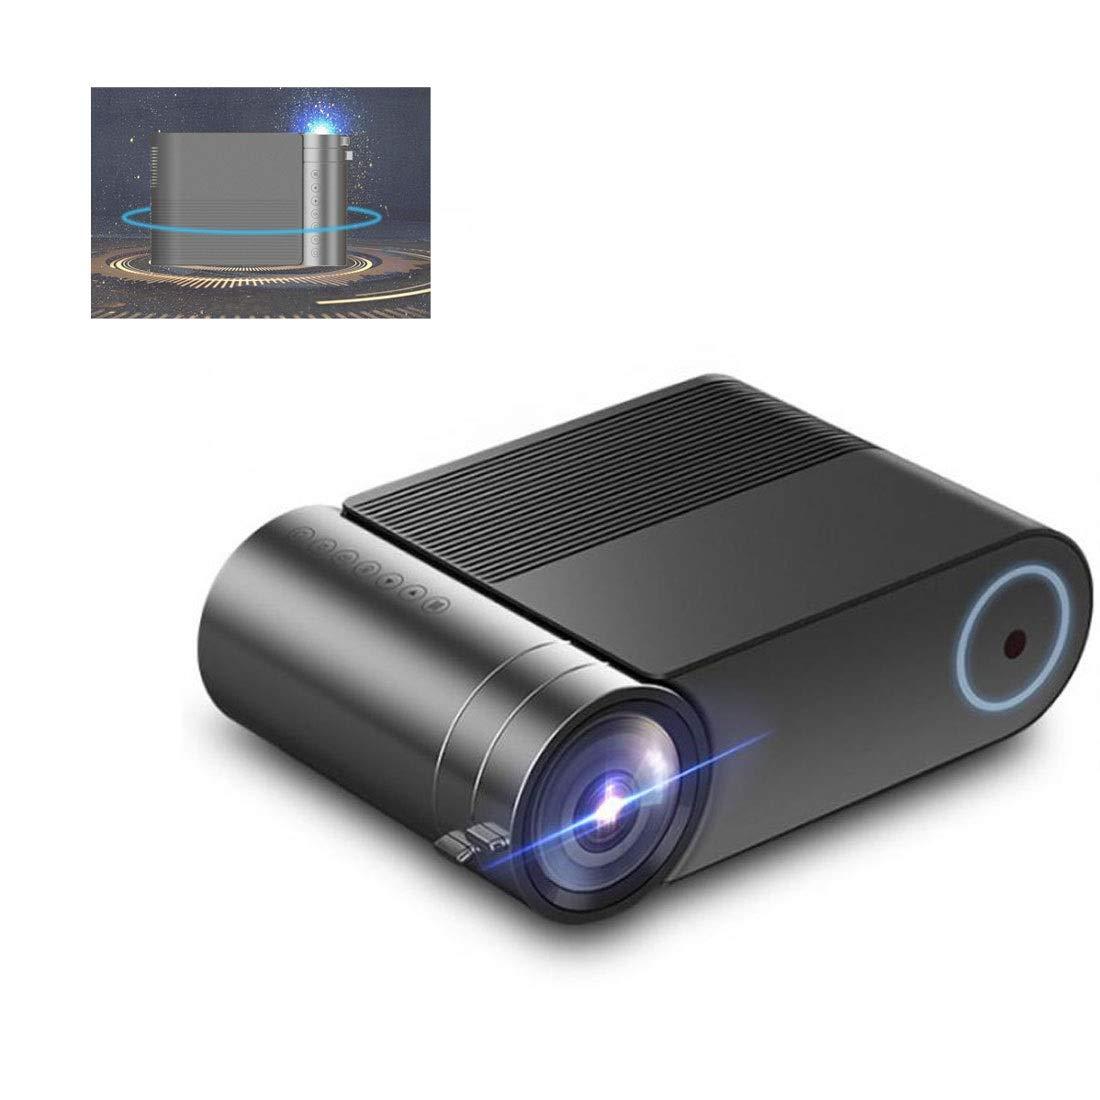 GJZhuan YG420 Mini LED 720P Proyector Nativo 1280x720 Portátil ...